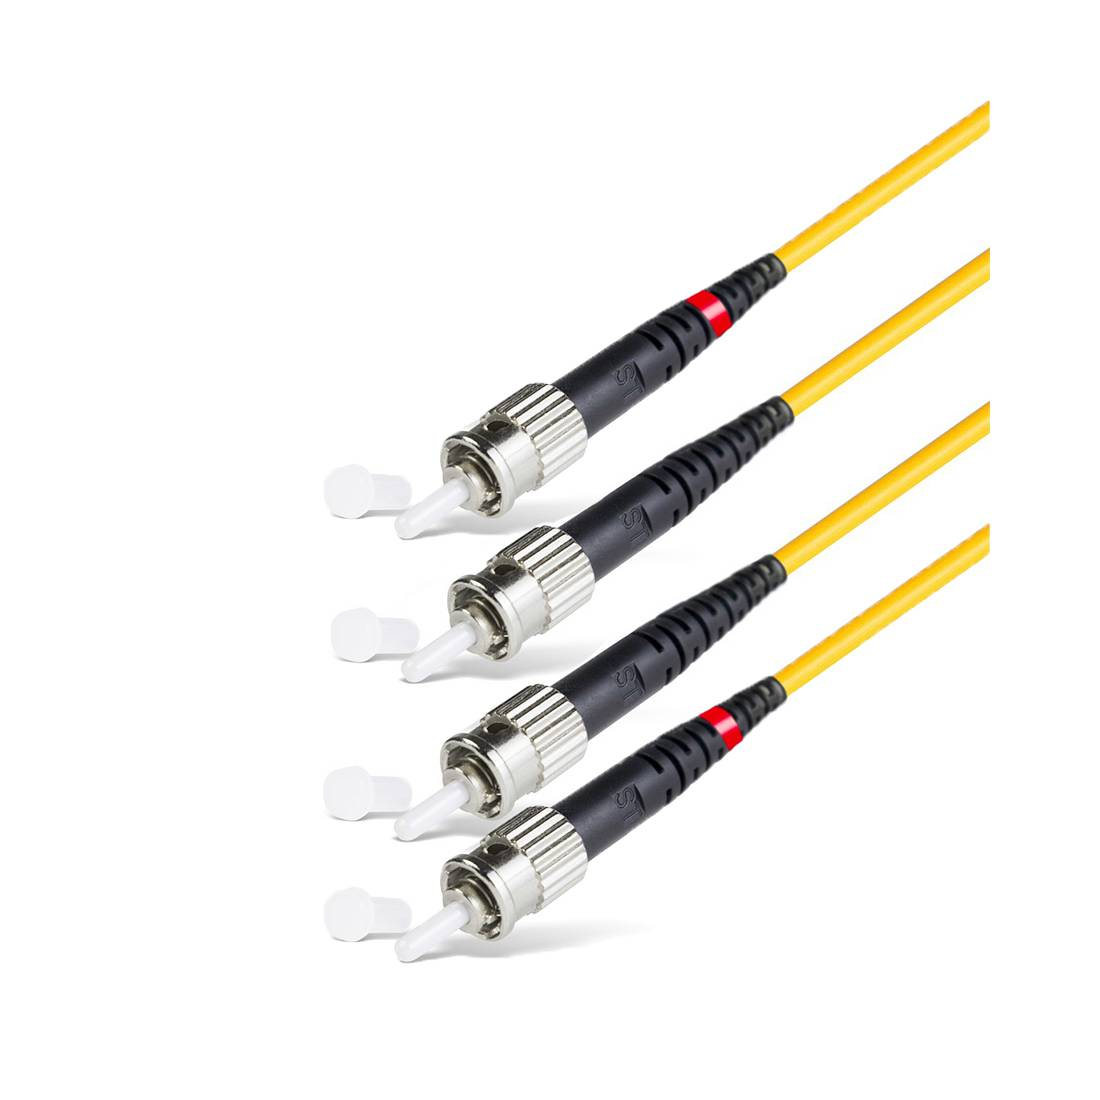 Оптический патч-корд (шнур) 2-ST 9-50